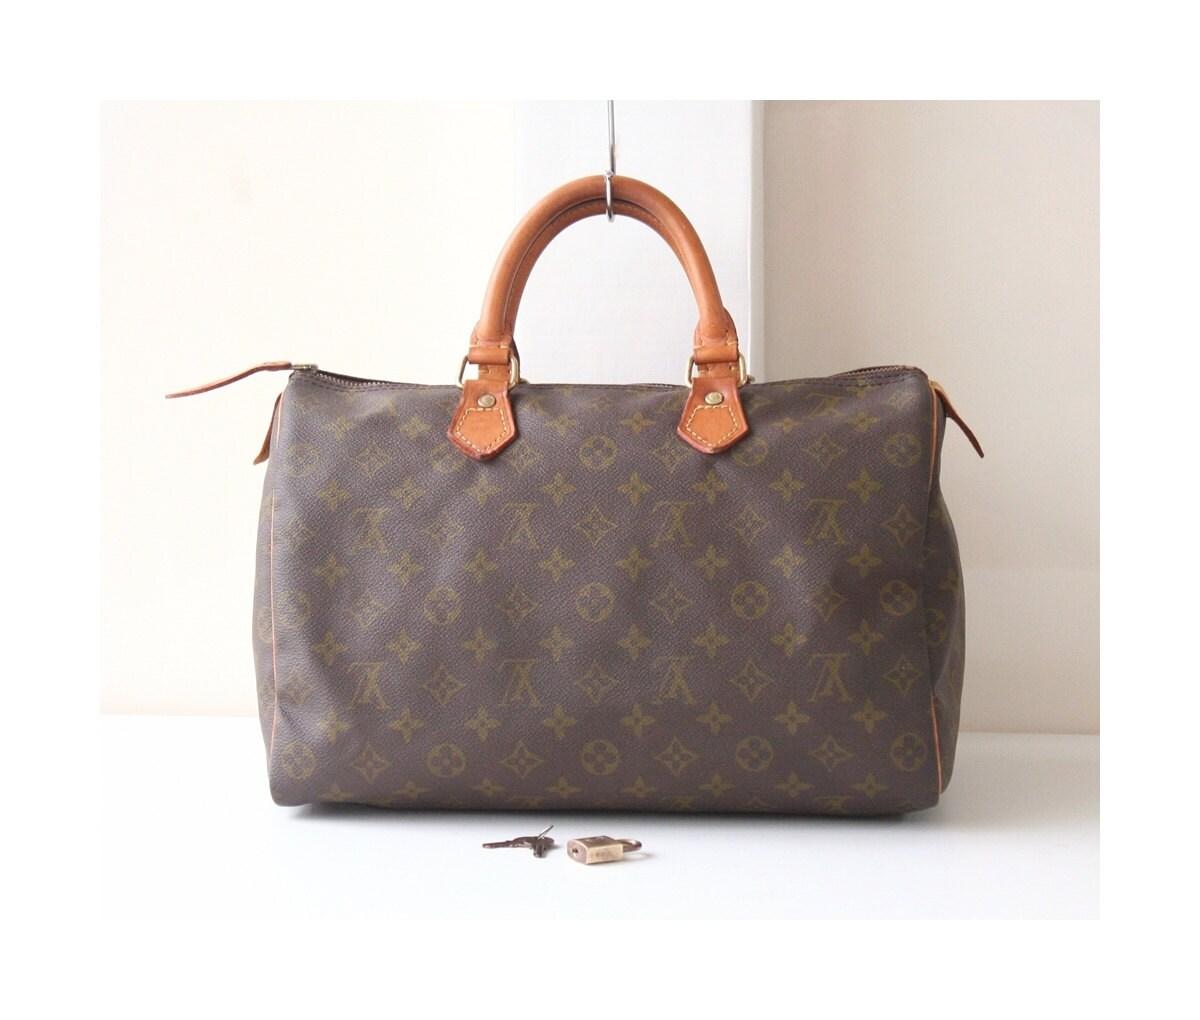 fb589f61398b Louis Vuitton Speedy 35 monogram tote bag brown bag vintage